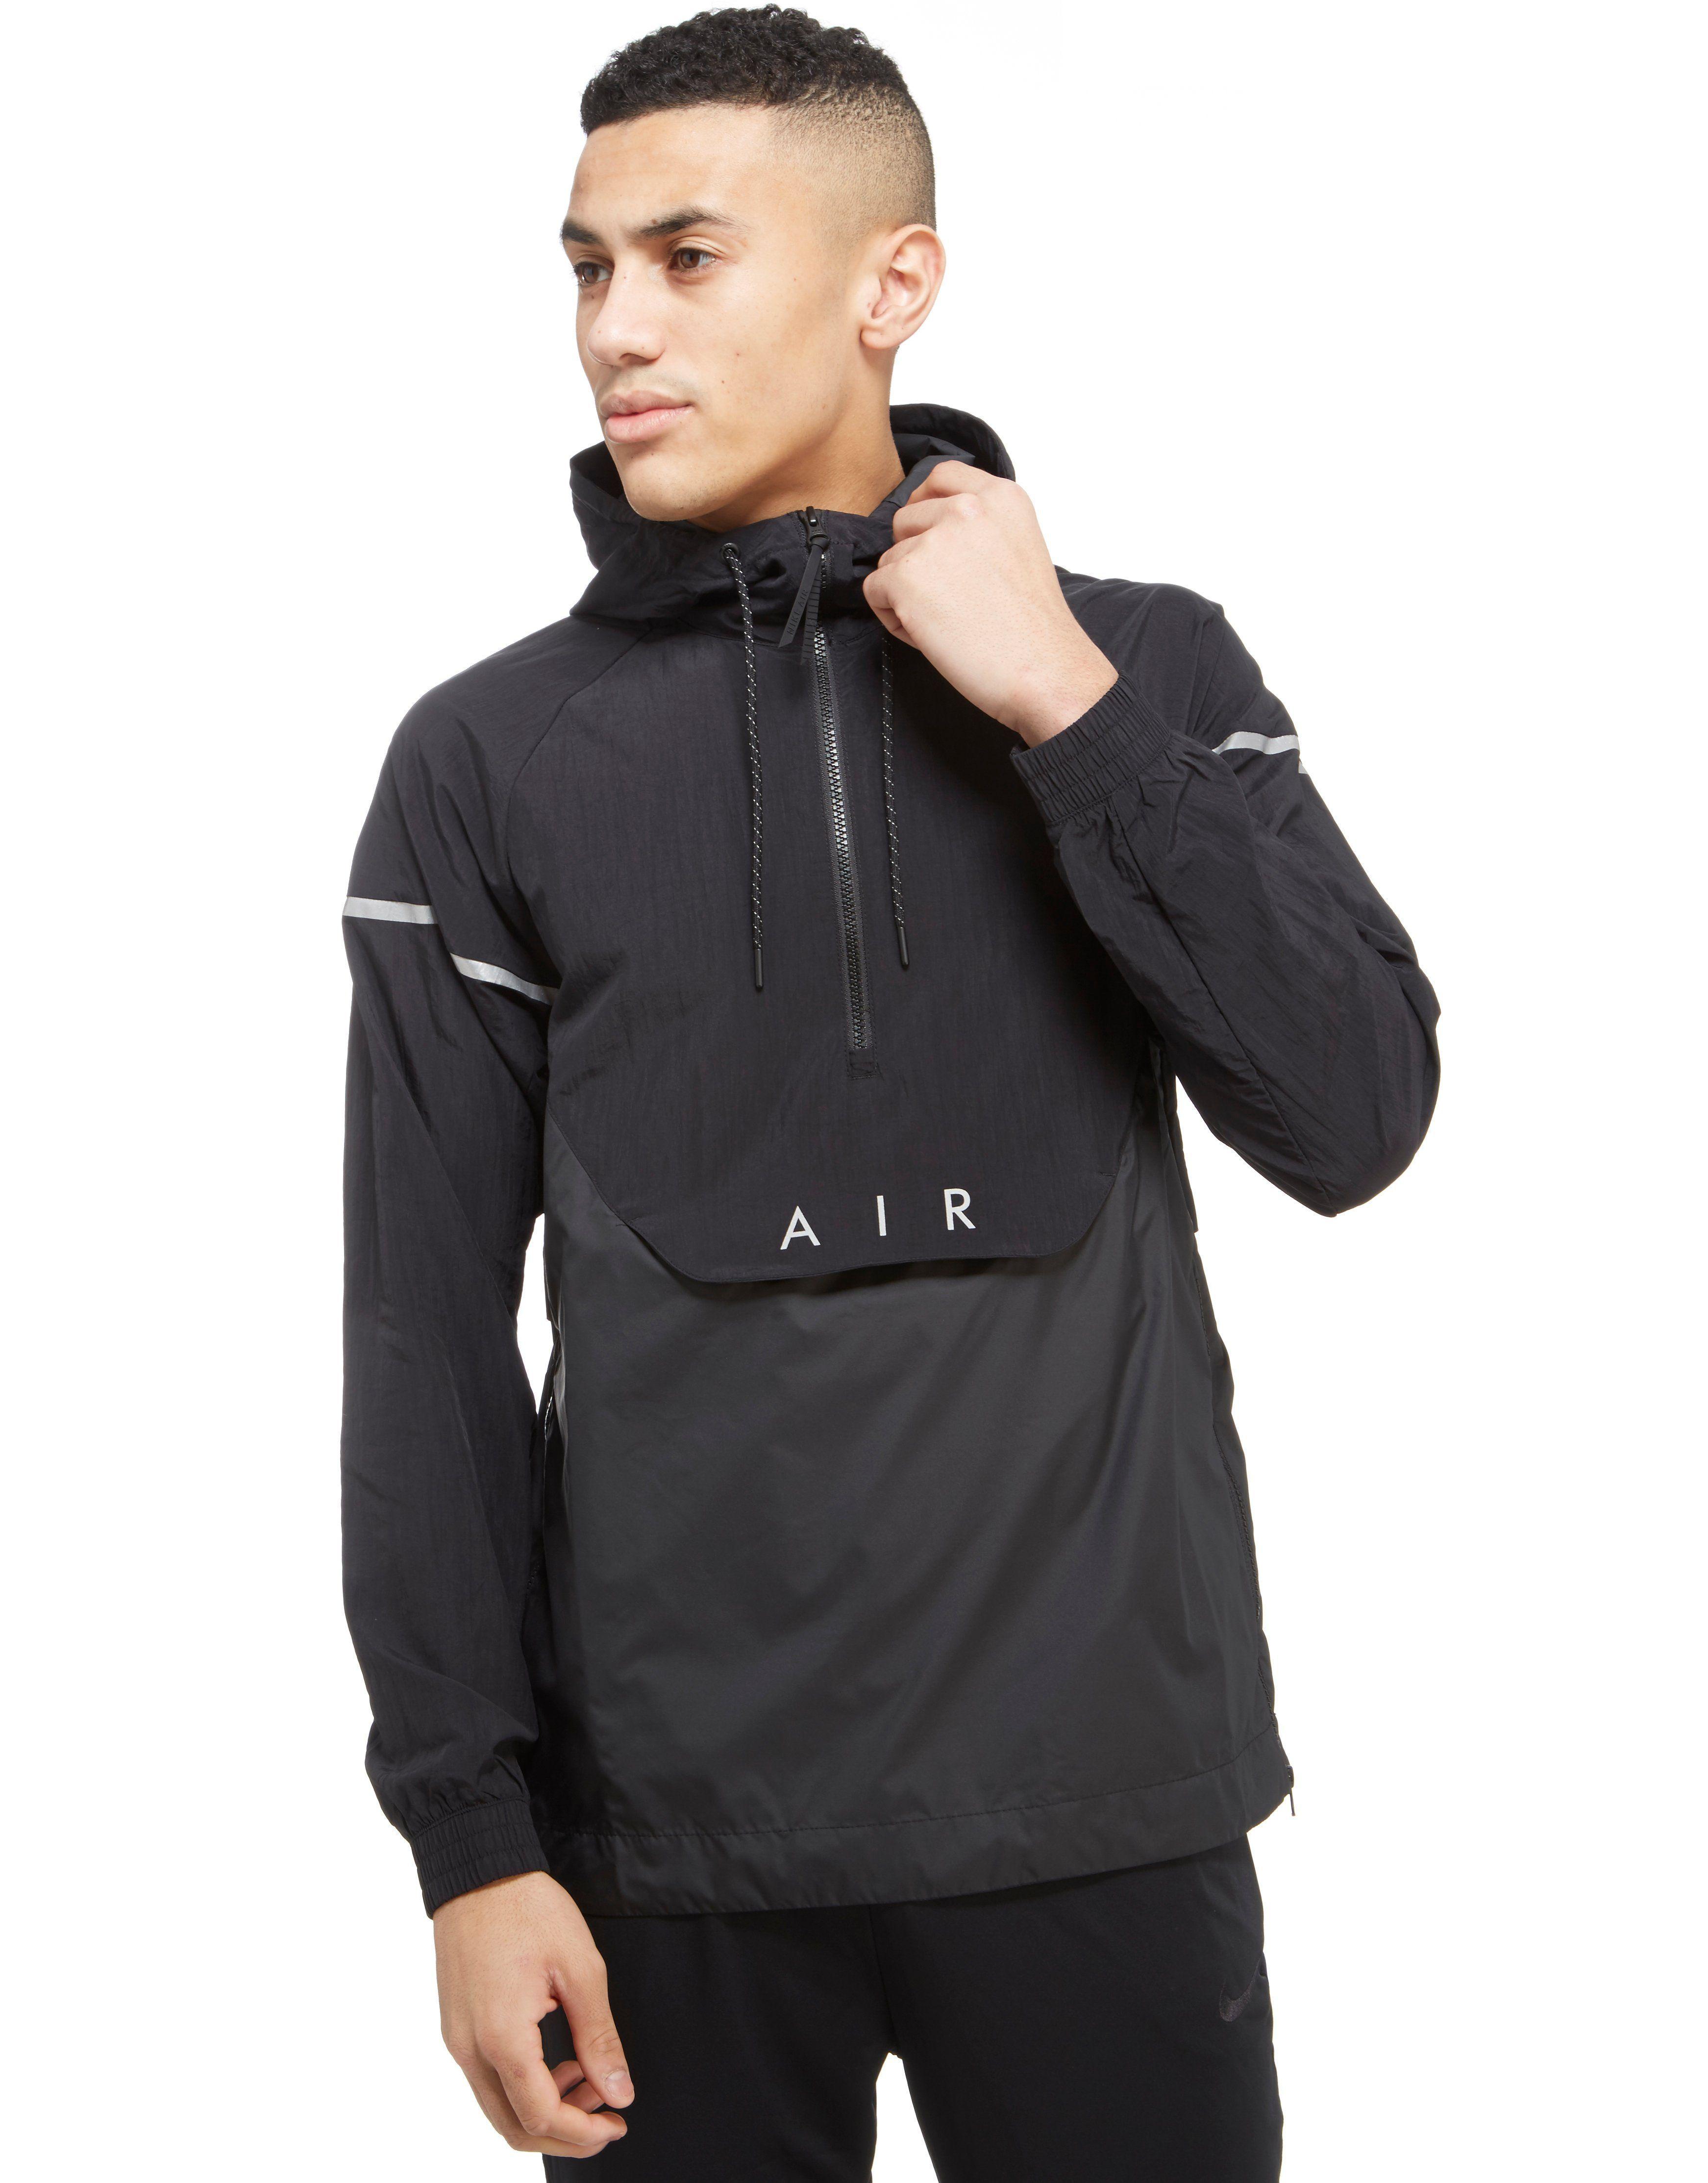 Nike epic jacket - Nike Air Hybrid 1 2 Zip Woven Jacket Shop Online For Nike Air Hybrid